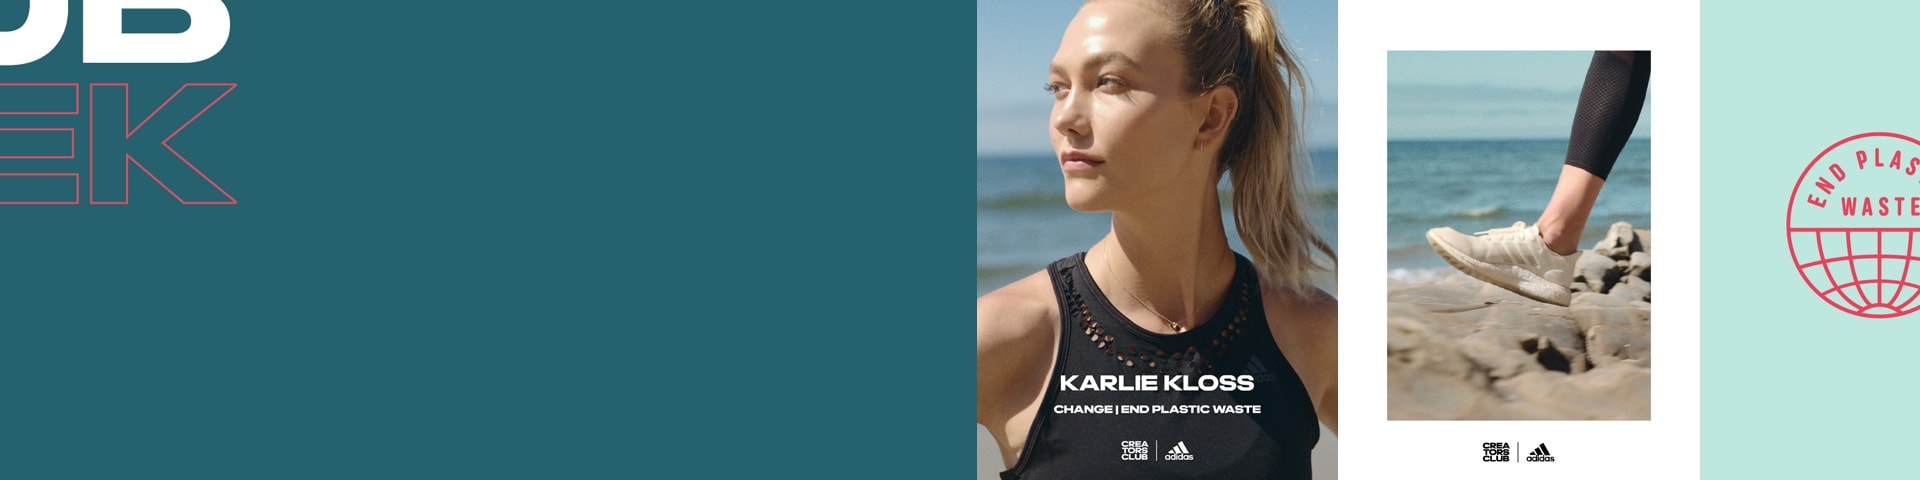 Entrepreneur Karlie Kloss in front of the sea. End Plastic Waste Logo